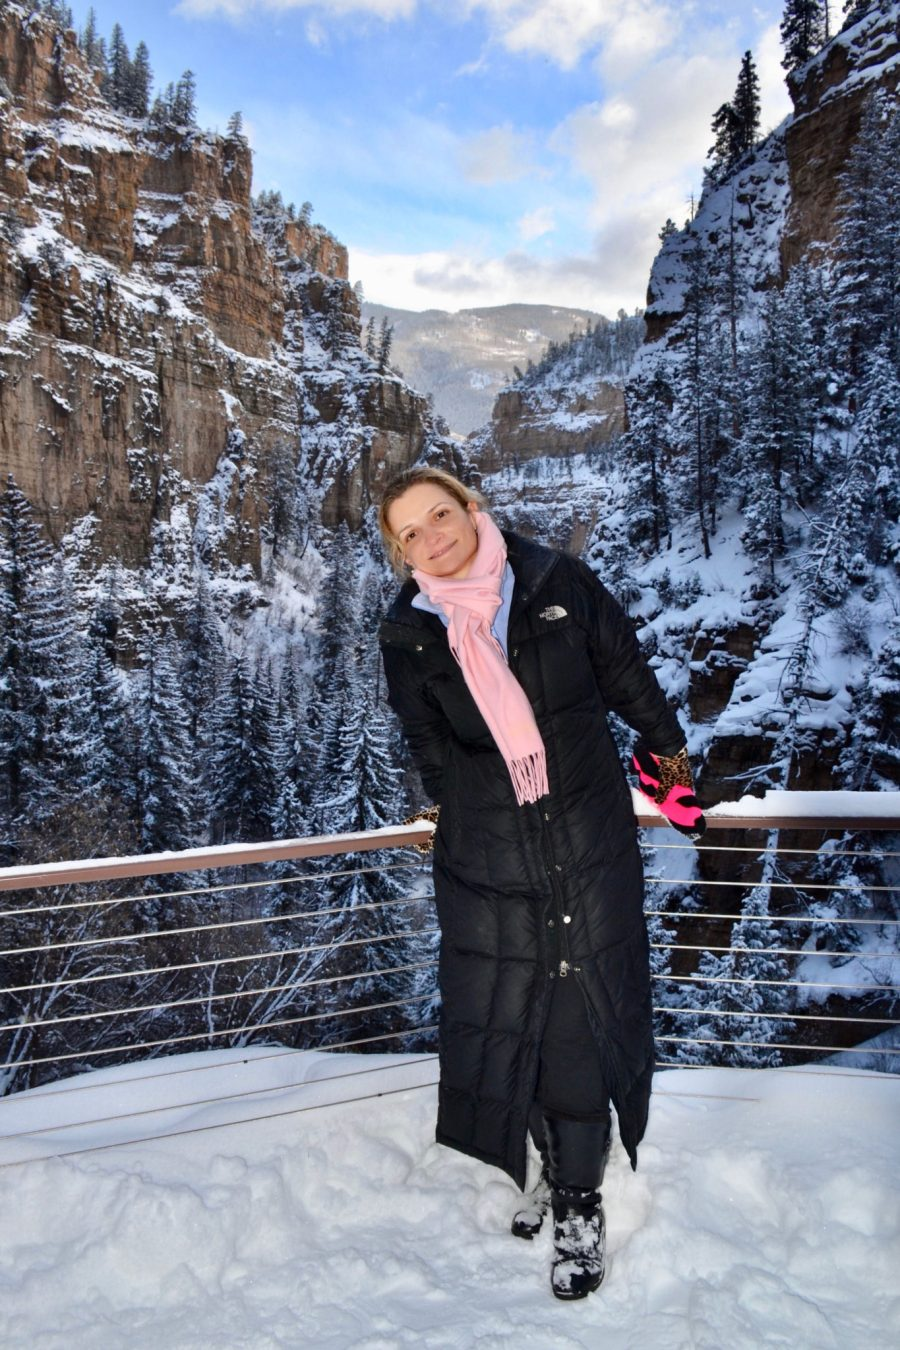 Posing with Glenwood Canyon